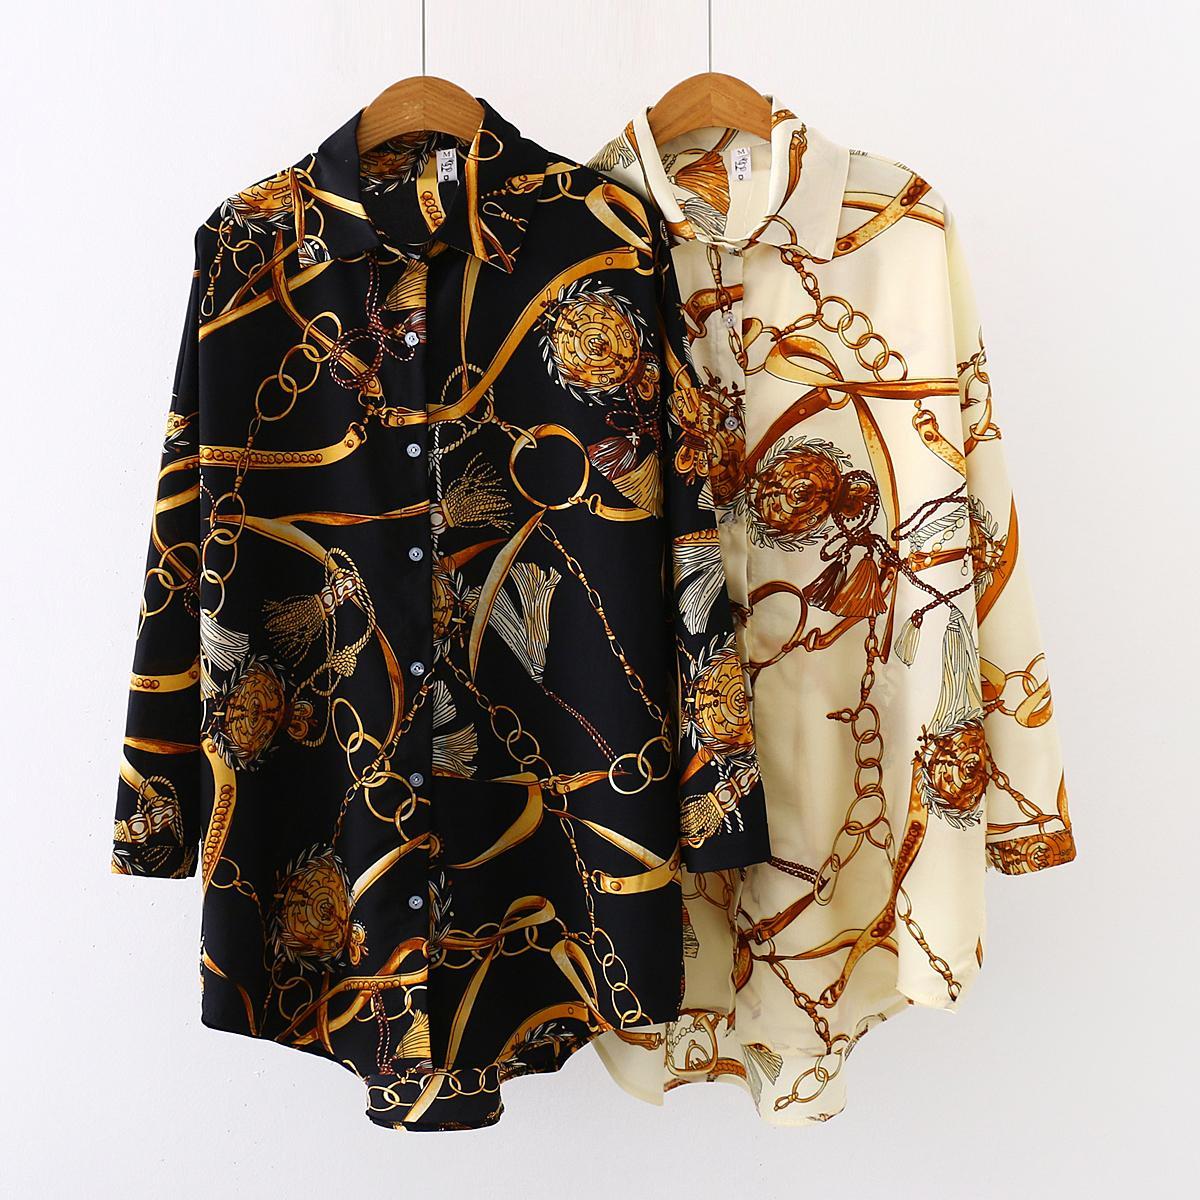 Plus size Fashion casual oversized Women Blouses 2020 Spring chiffon Blouse three quarter sleeve Loose Tops Shirts Blusas Mujer Blouses & Shirts  - AliExpress